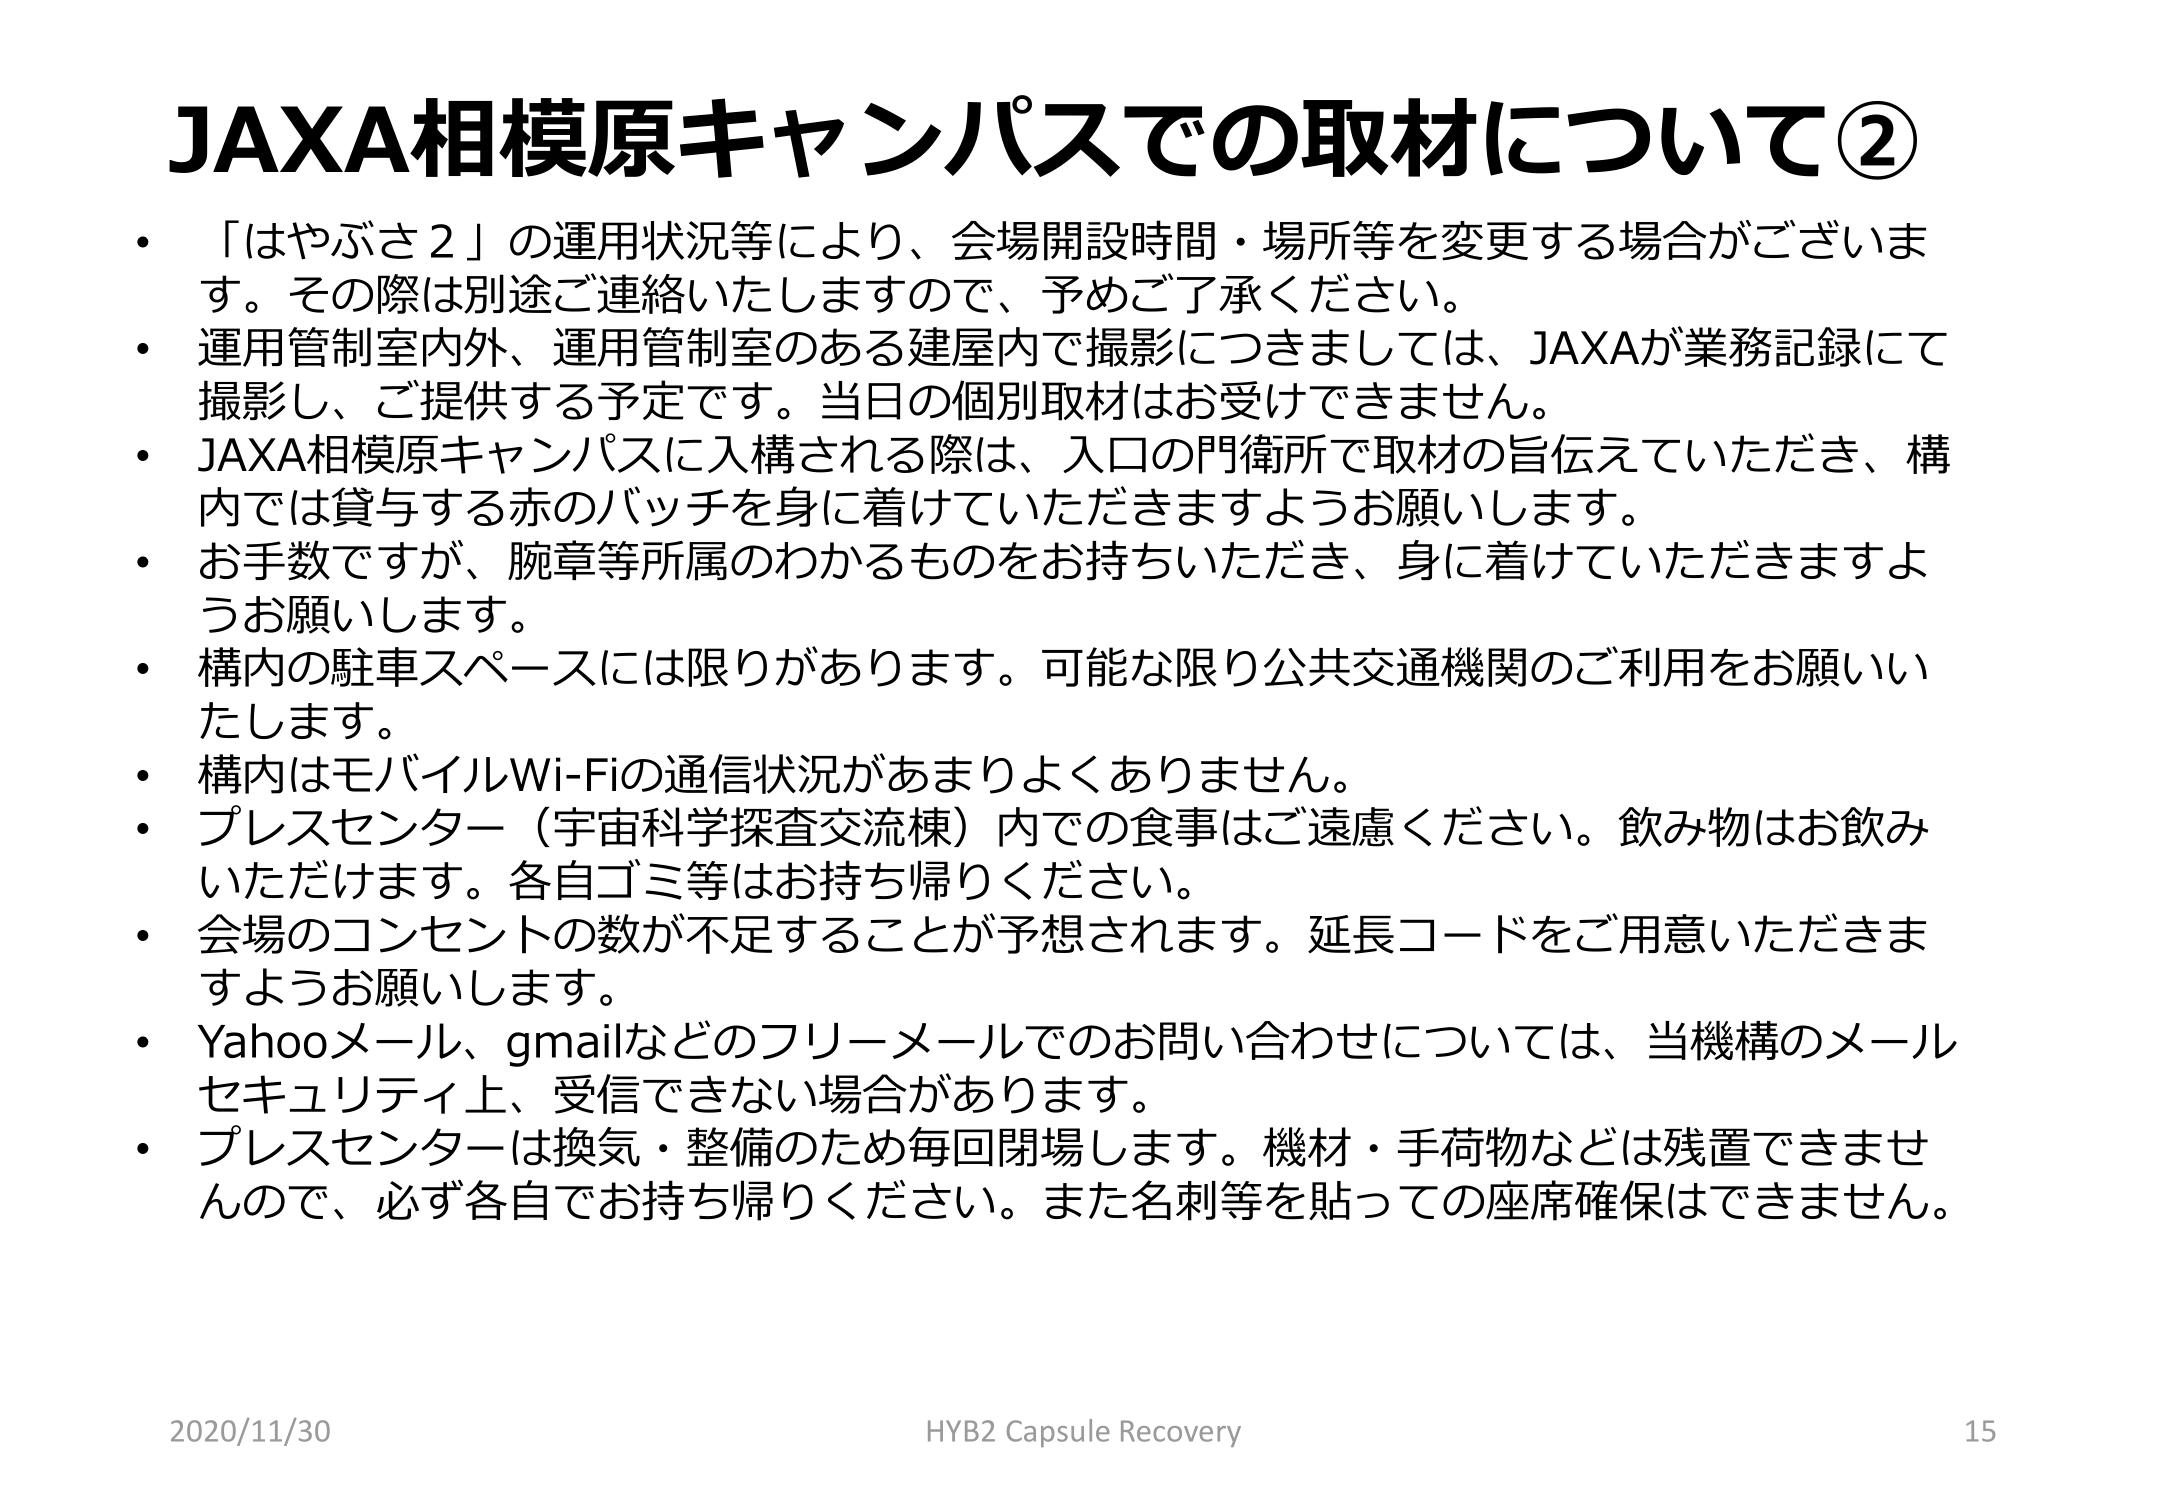 f:id:Imamura:20201130154454p:plain:h250